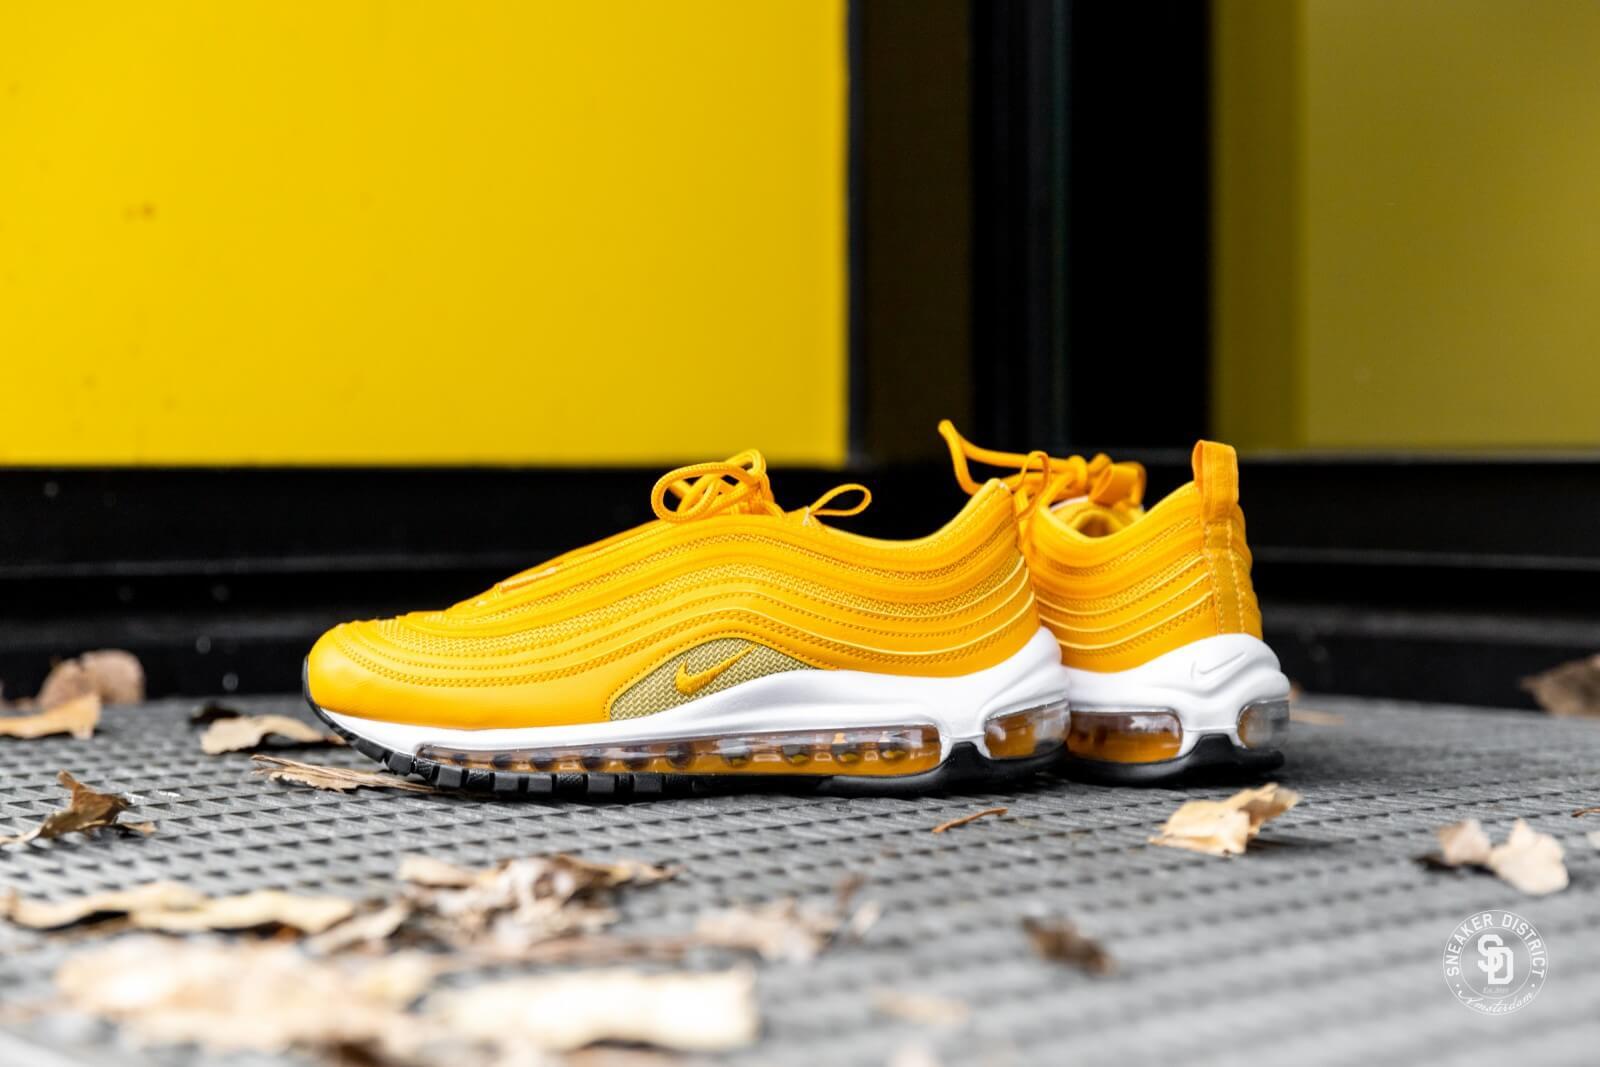 Nike Women's Air Max 97 Mustard/Buff Gold